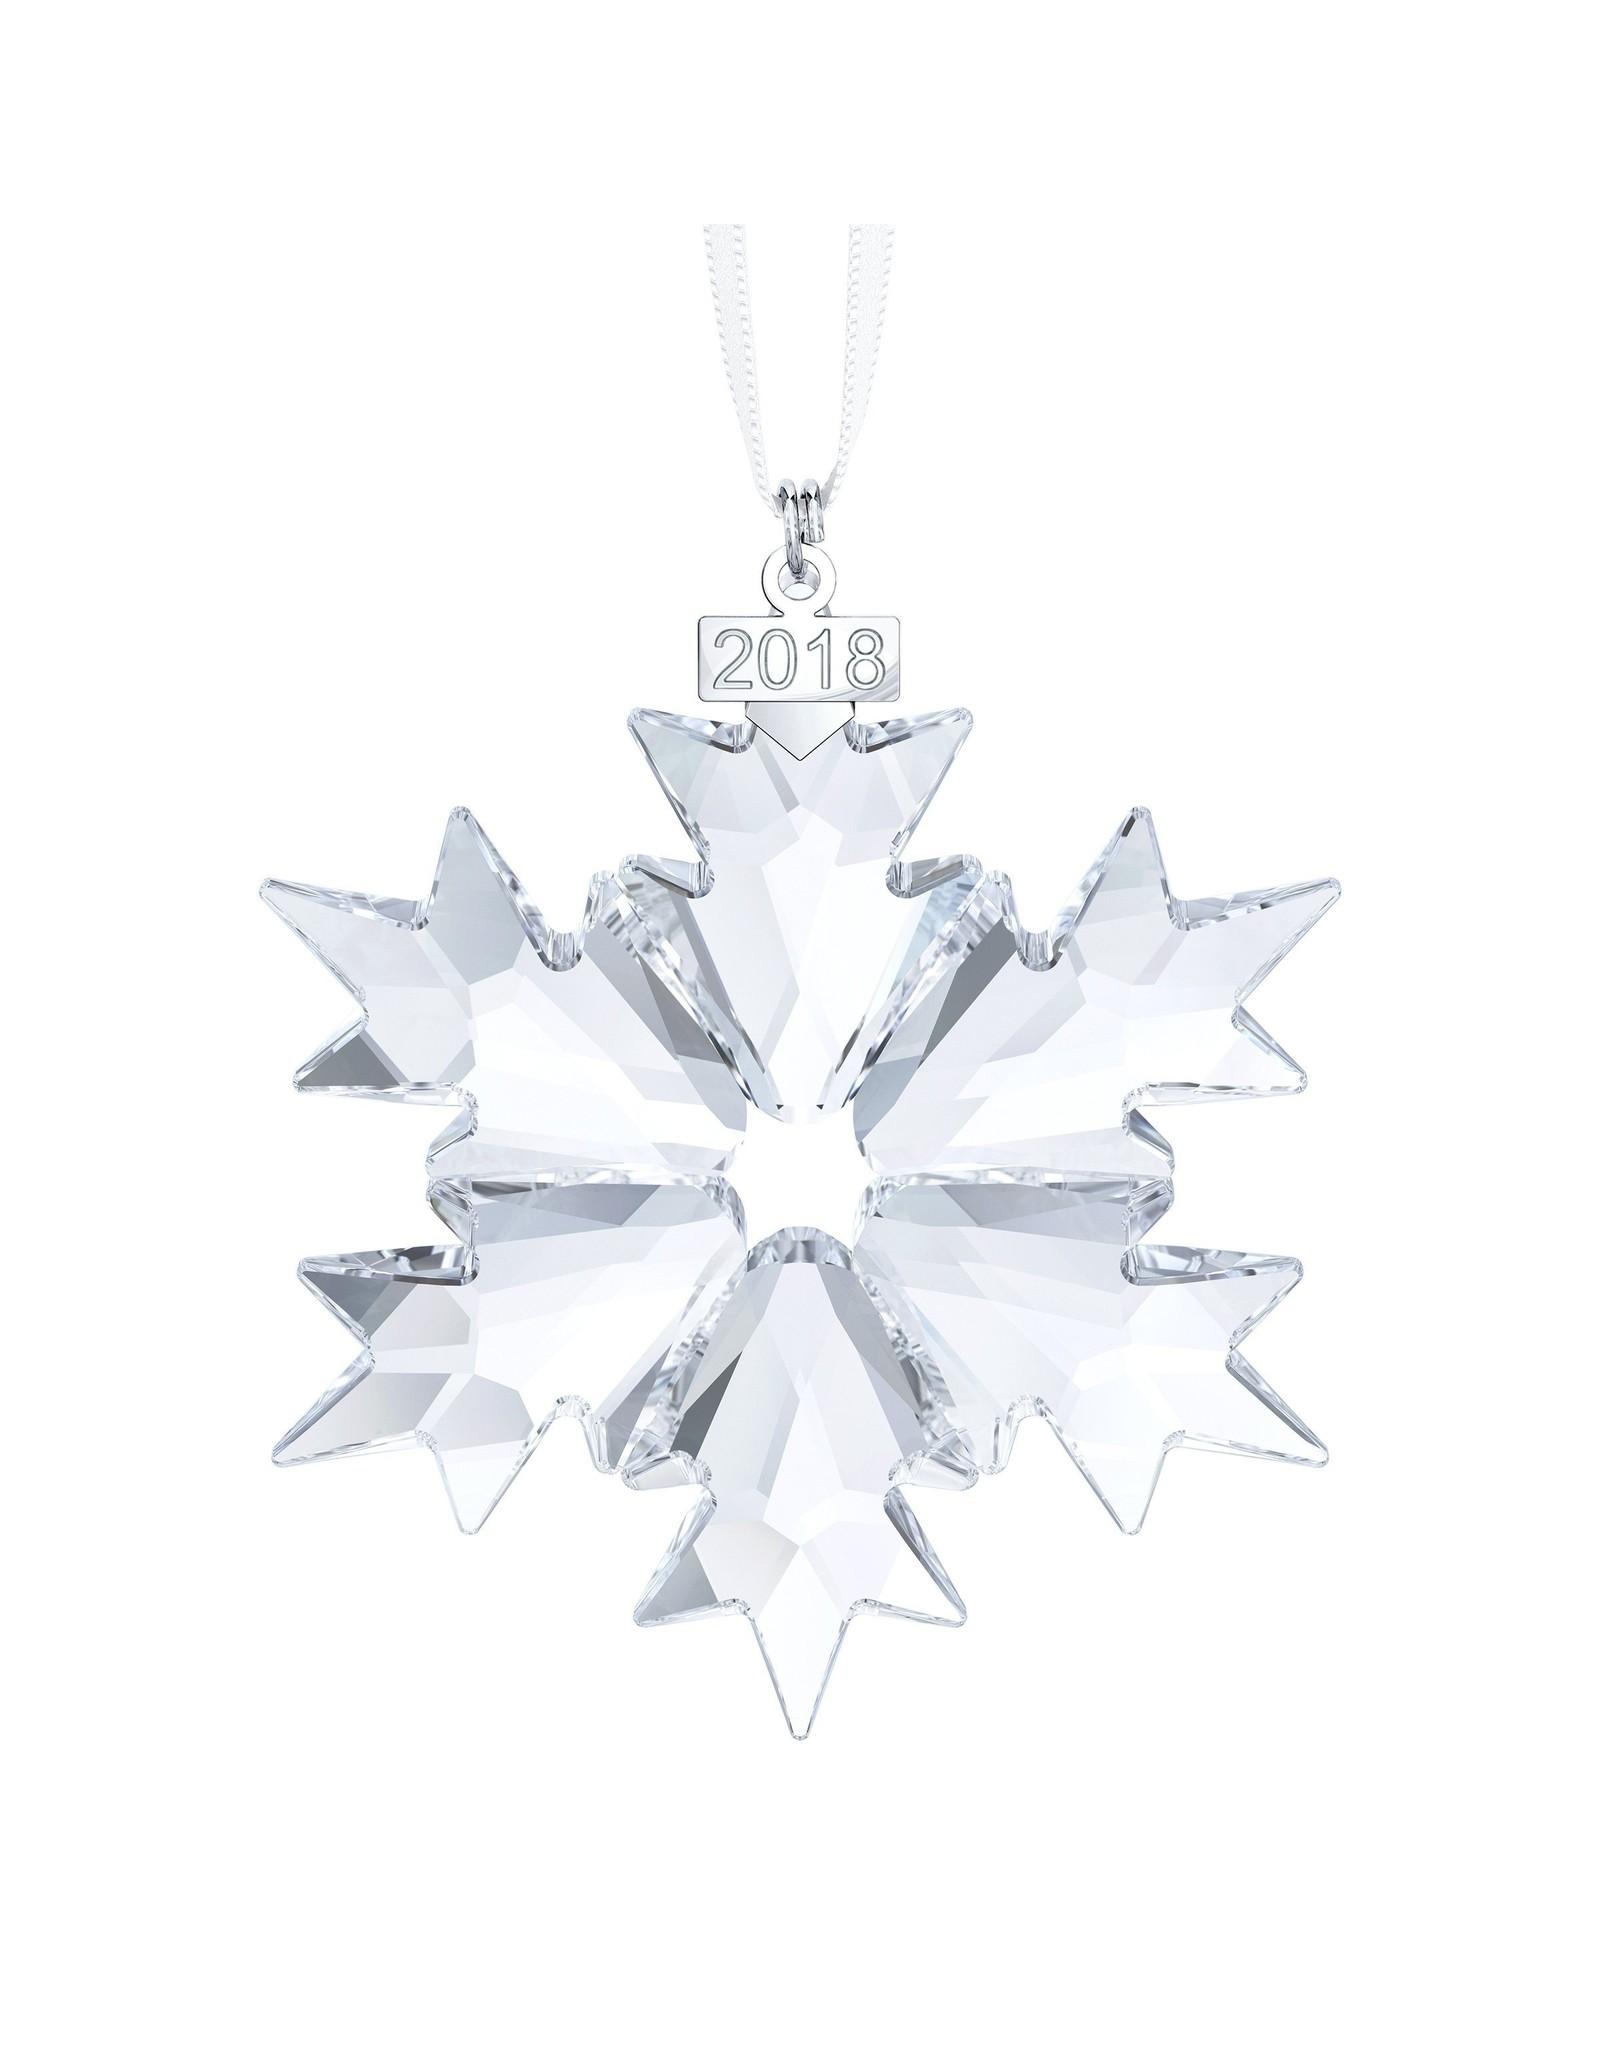 Swarovski Swarovski Christmas Ornament 2018